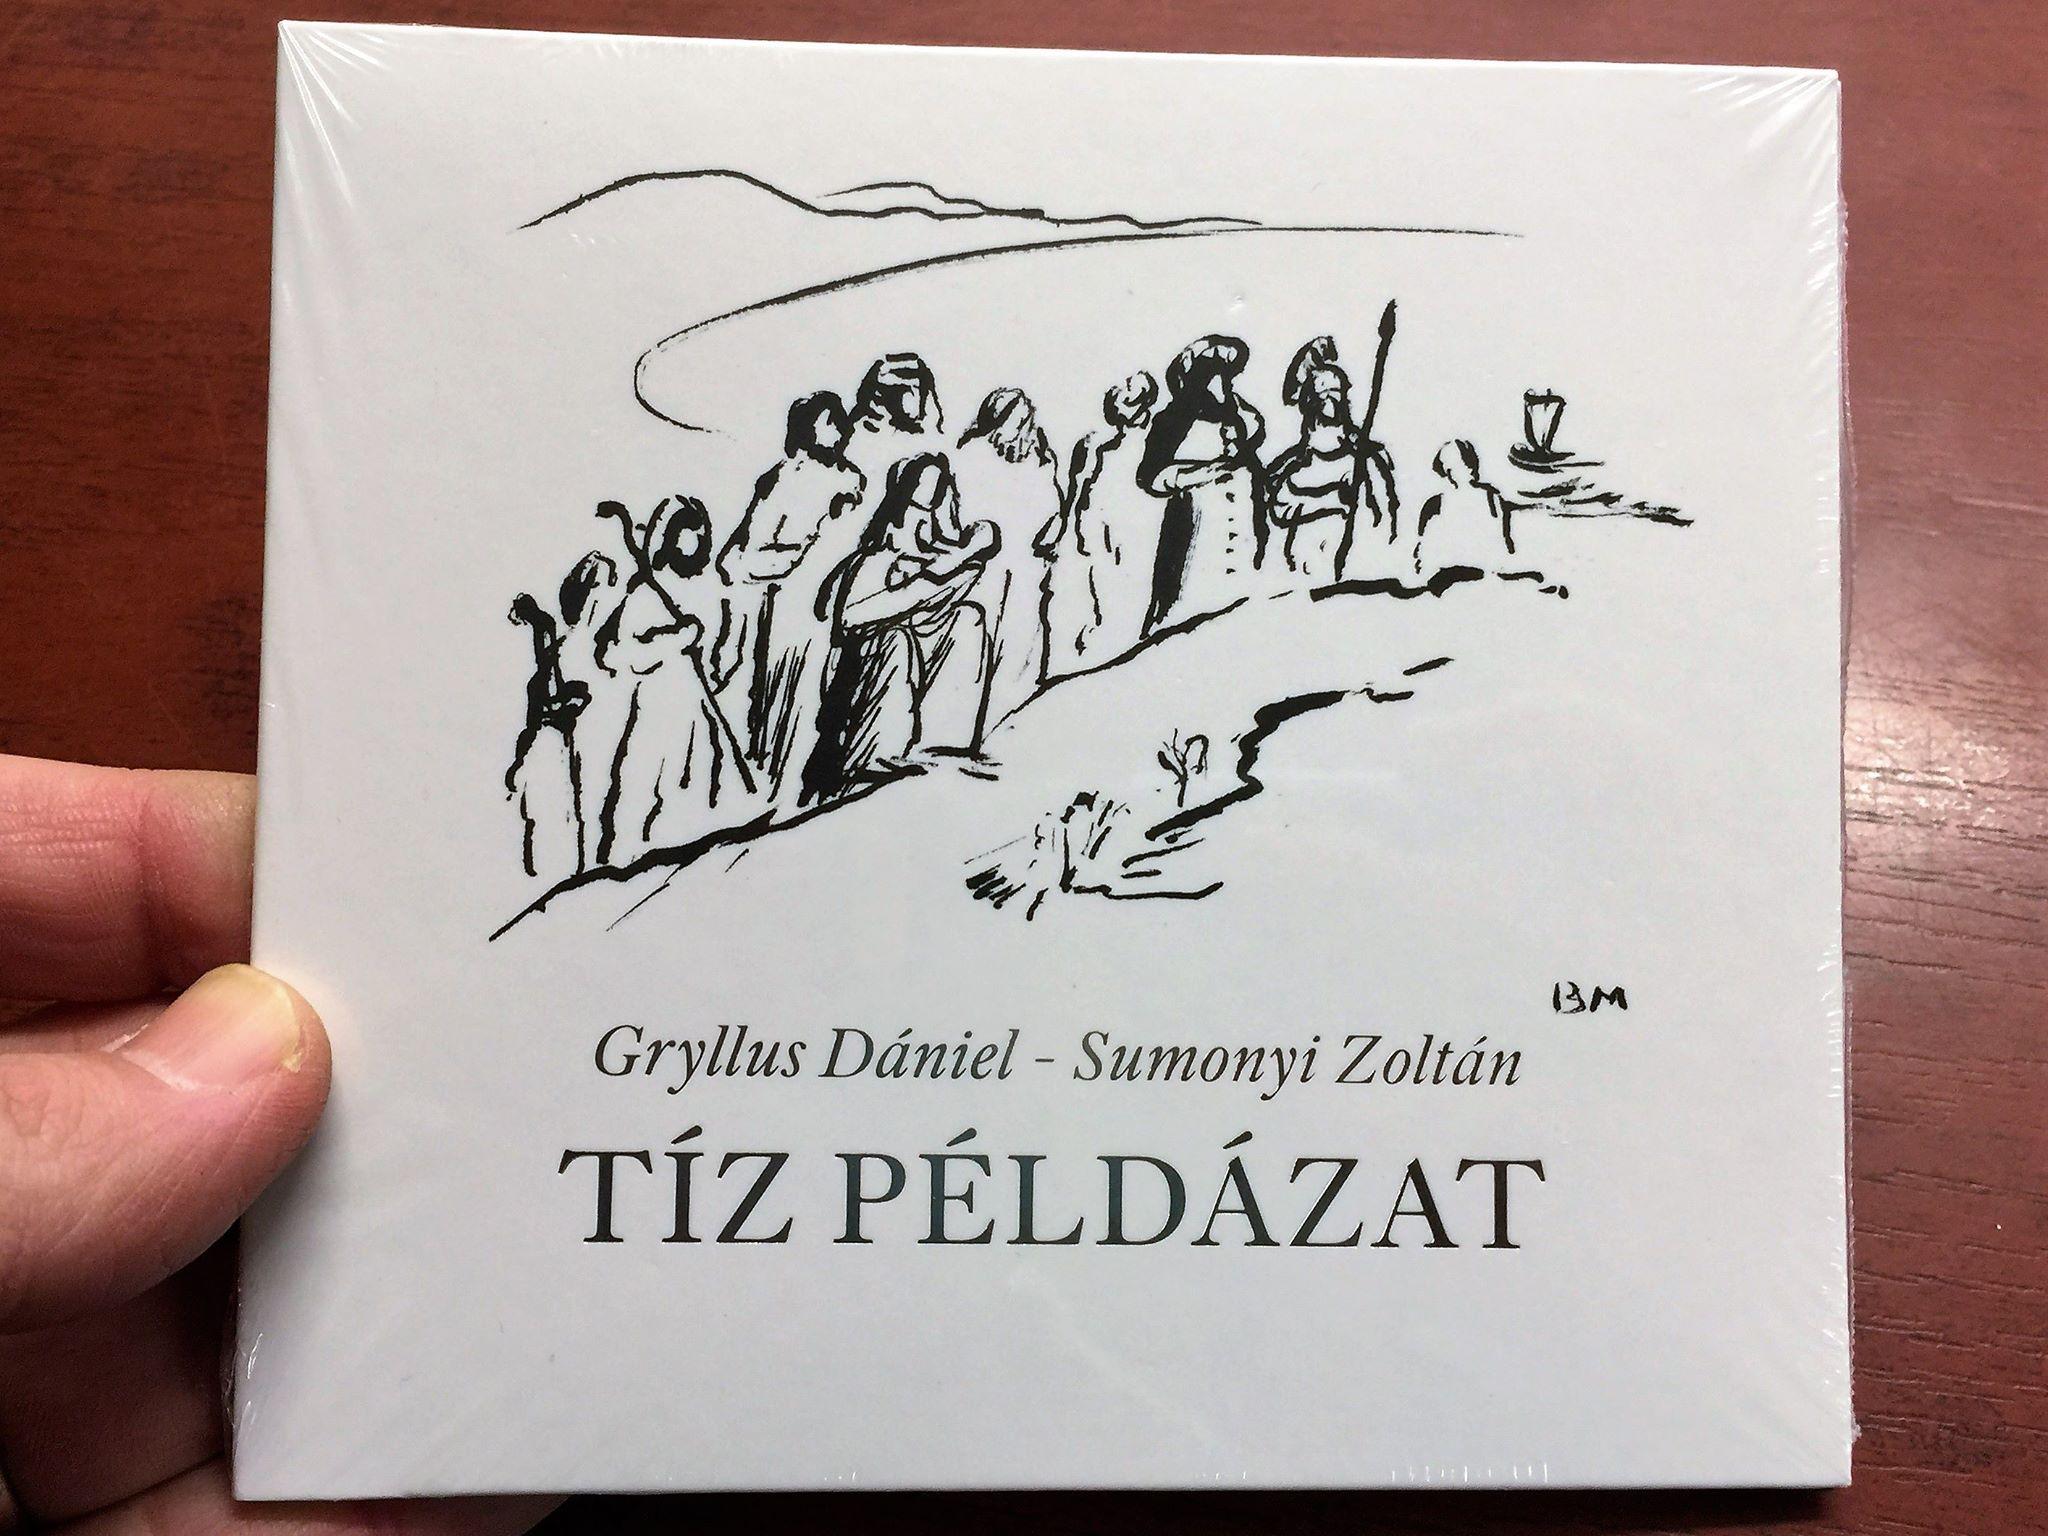 t-z-p-ld-zat-ten-parables-gryllus-d-niel-sumonyi-zolt-n-hungarian-cd-2017-gcd-188-1-.jpg